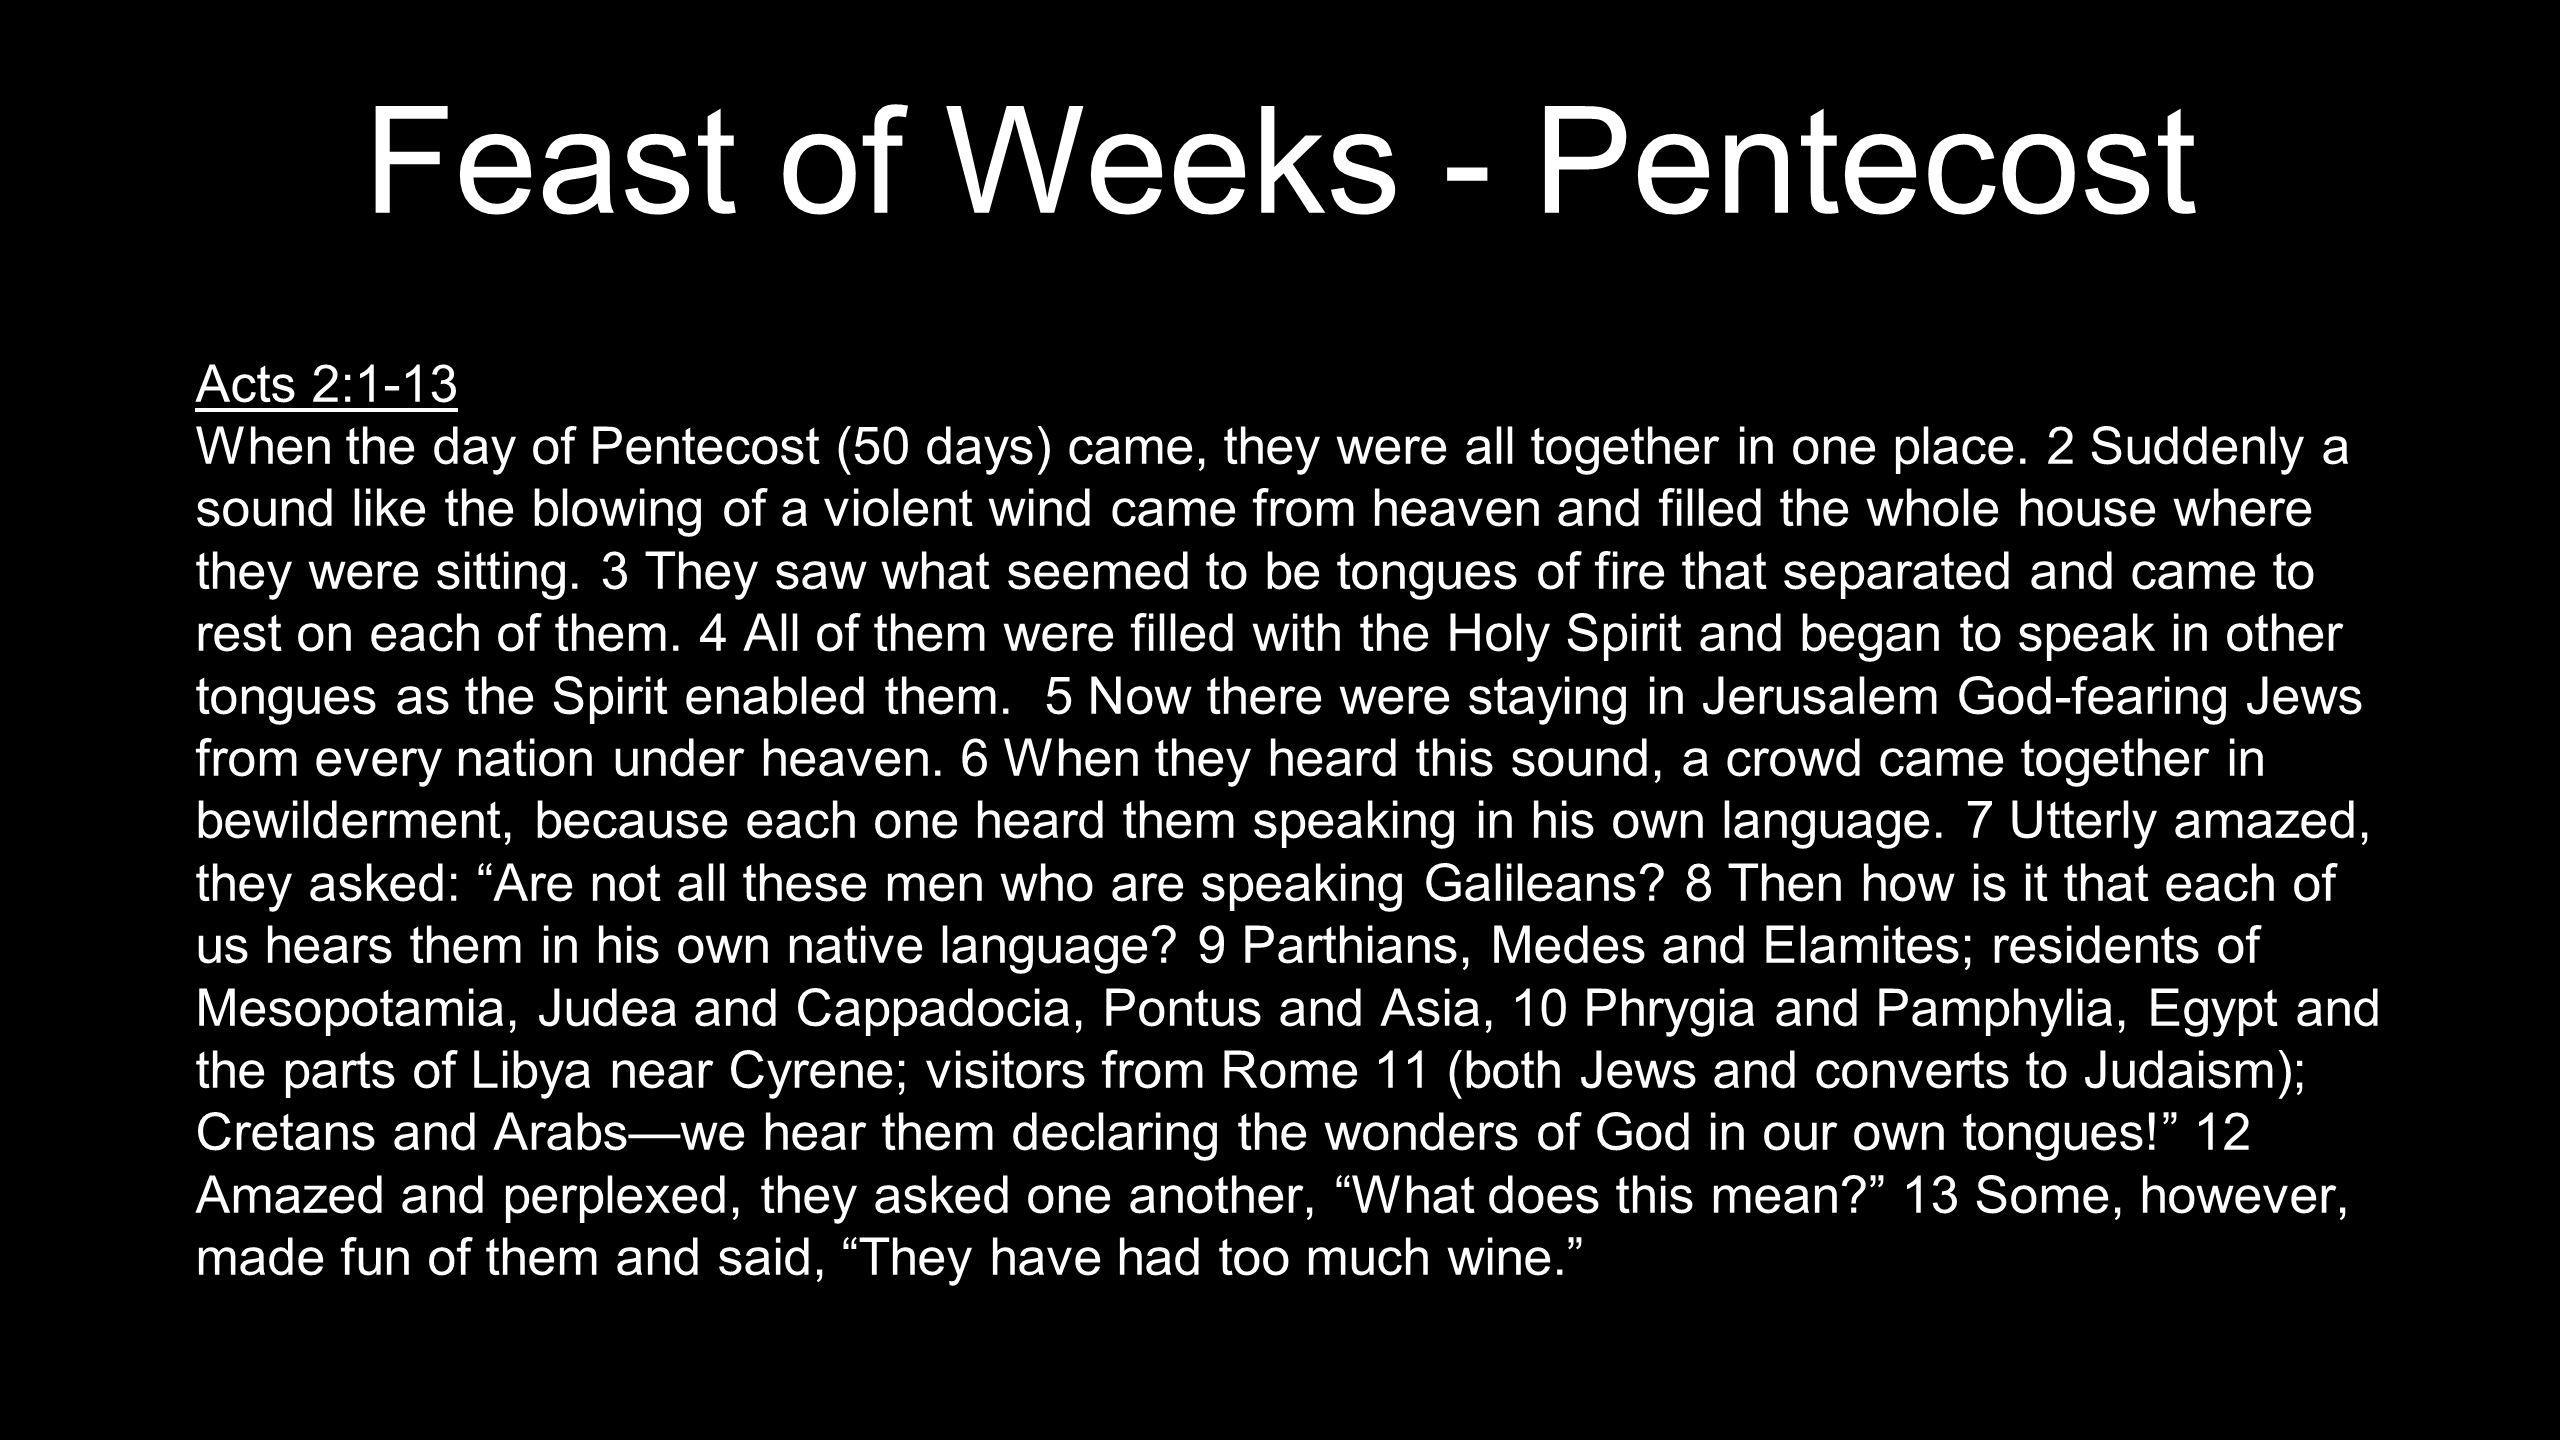 Feast of Weeks - Pentecost